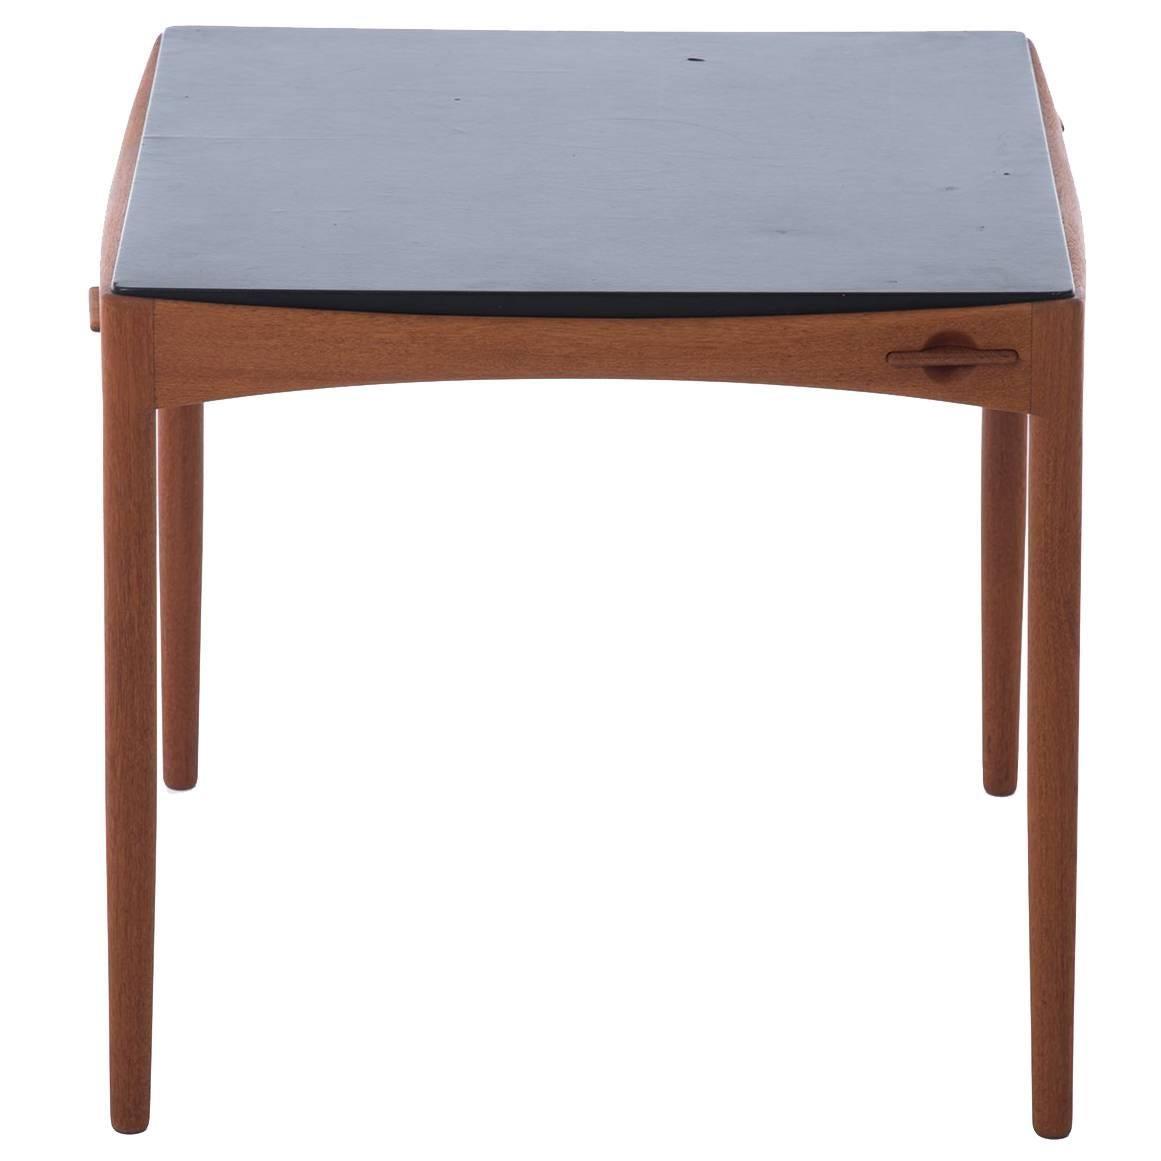 Danish Modern Game Table